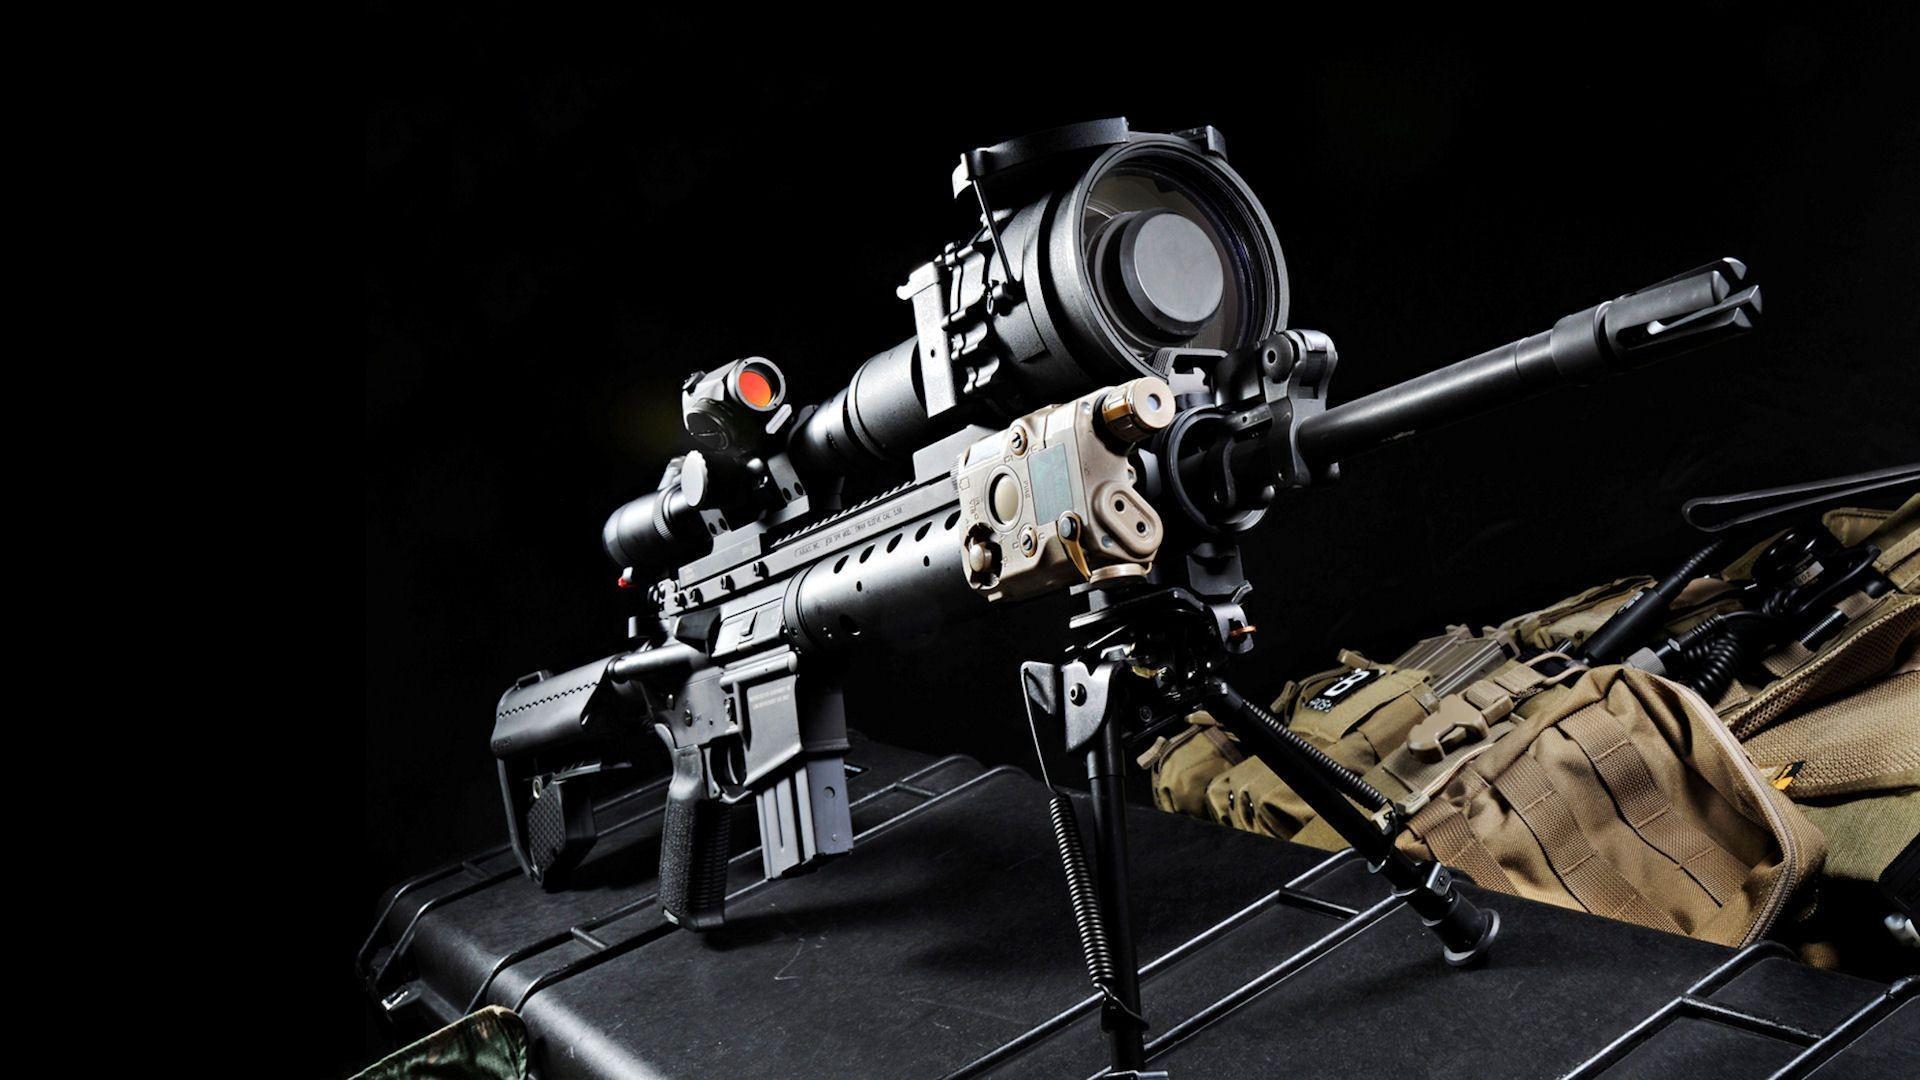 1920x1080 Sniper Gun Wallpaper Download Smith